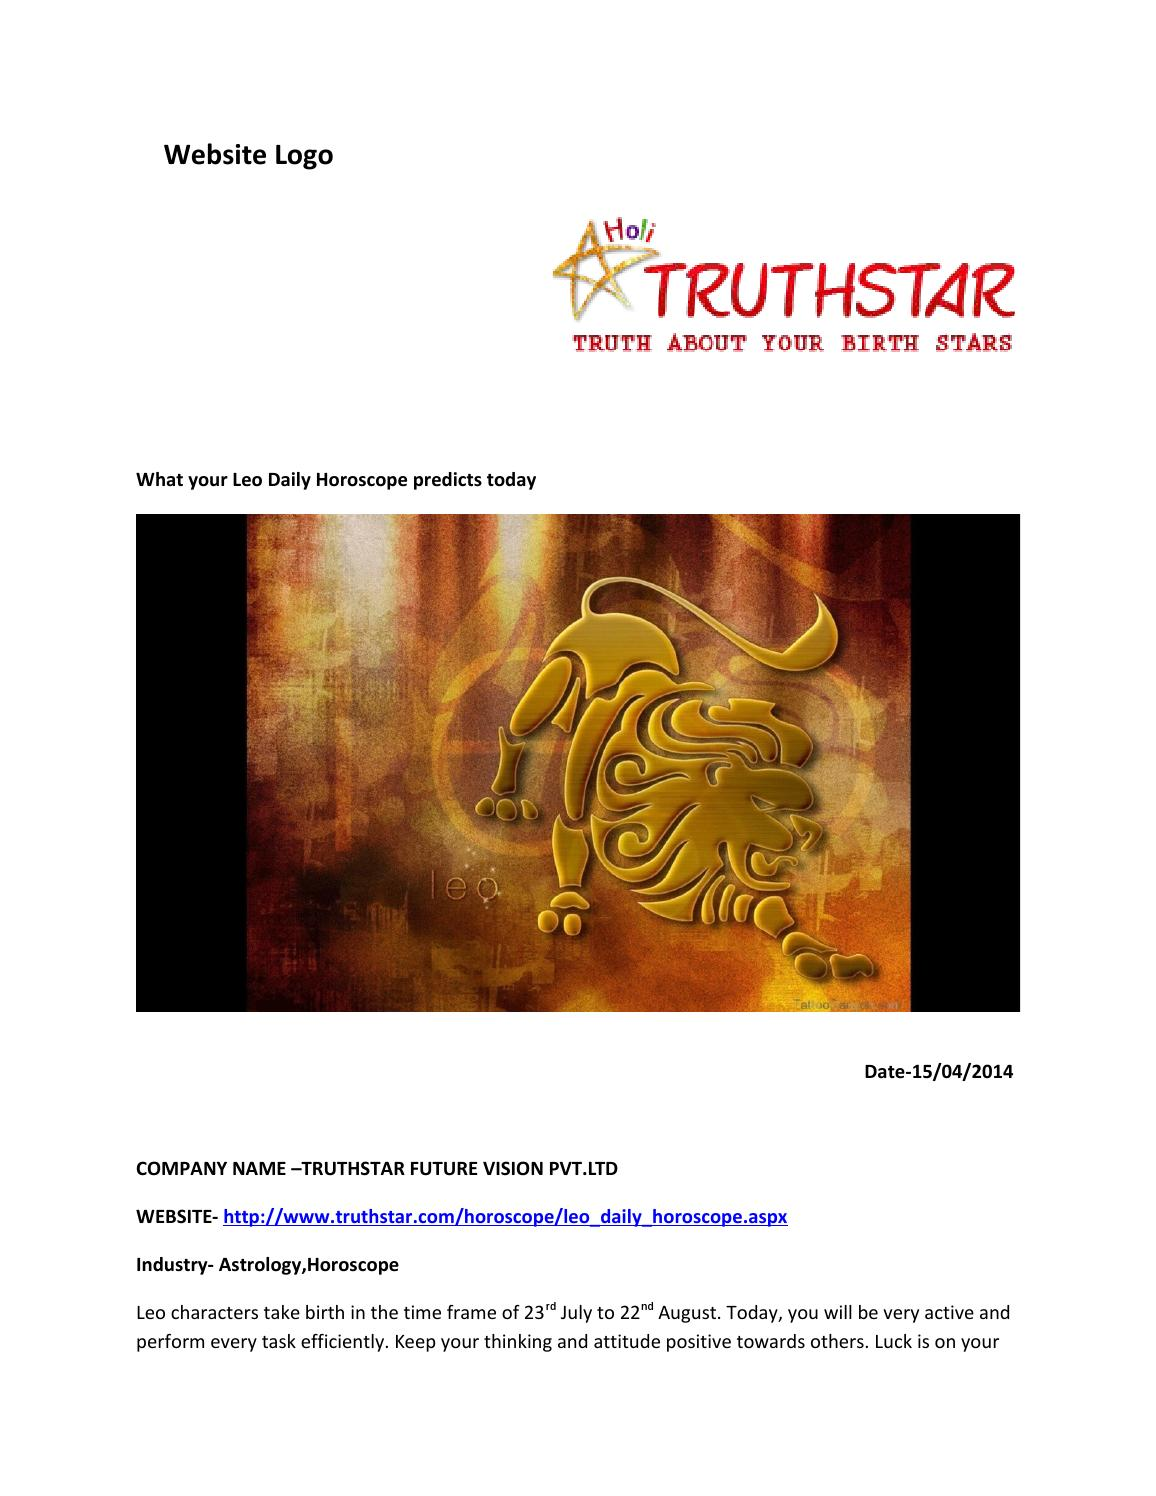 leo daily love horoscope truthstar